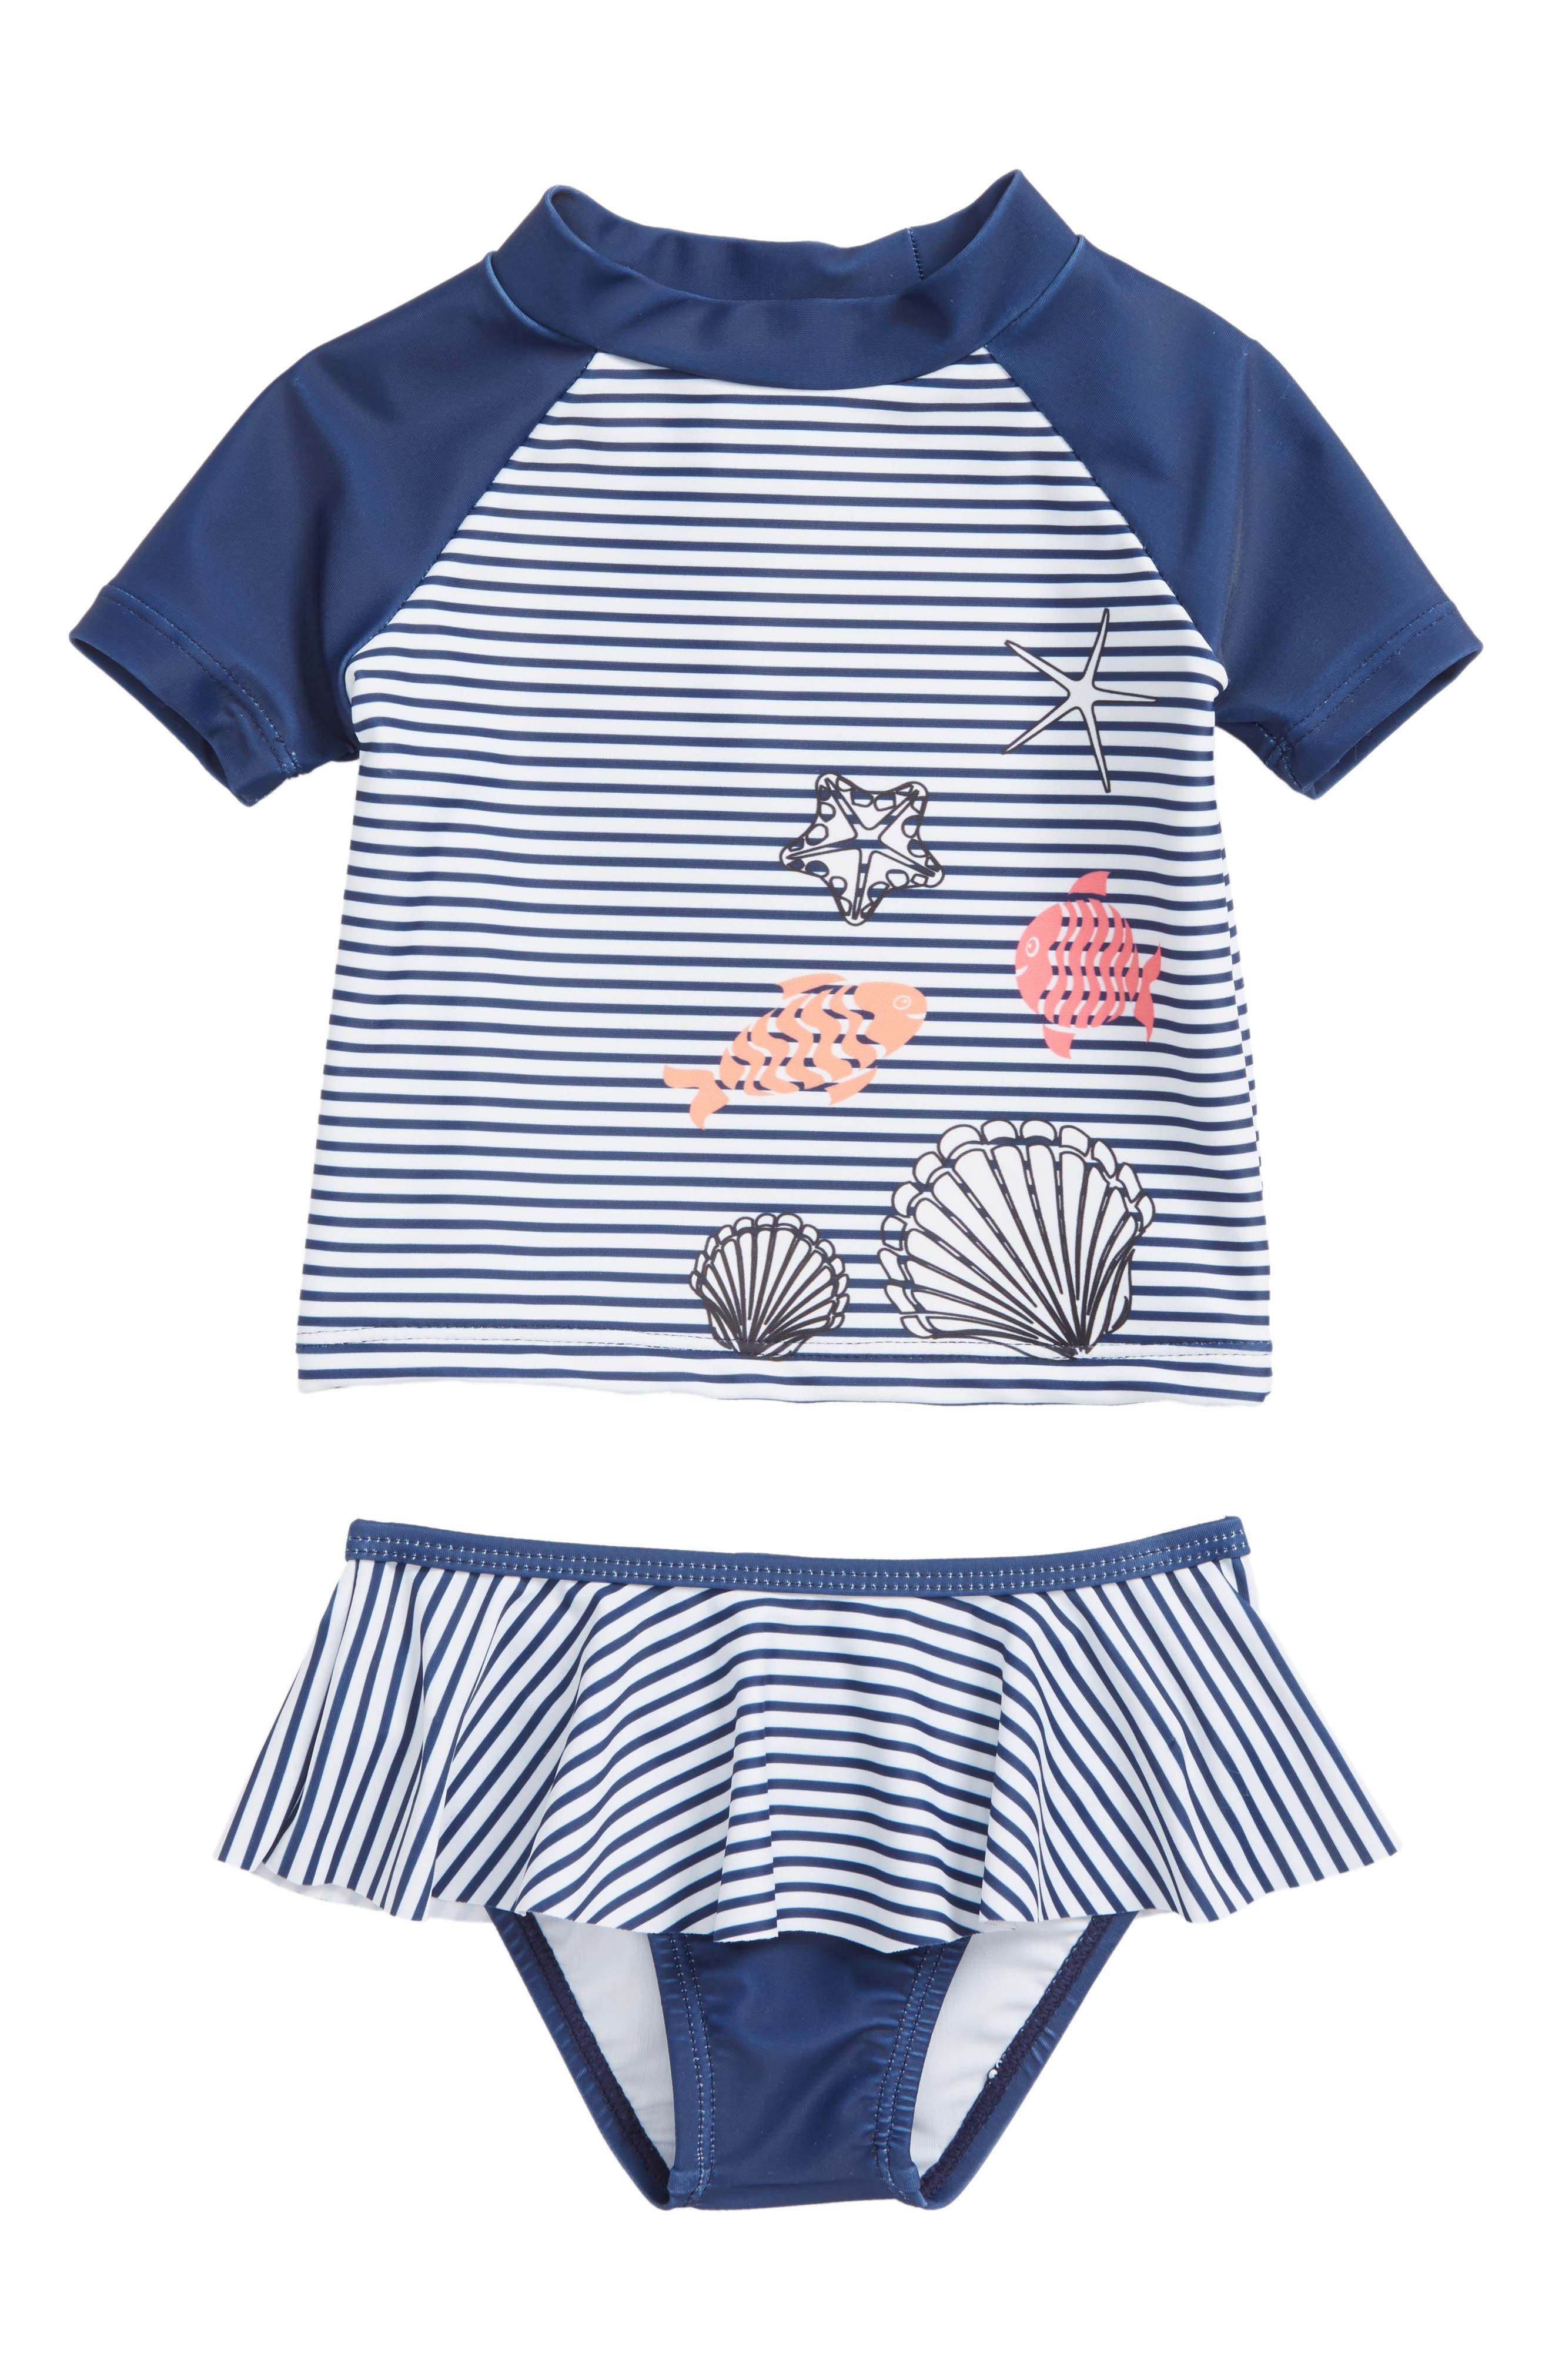 Skirted Two-Piece Rashguard Swimsuit,                             Main thumbnail 1, color,                             410